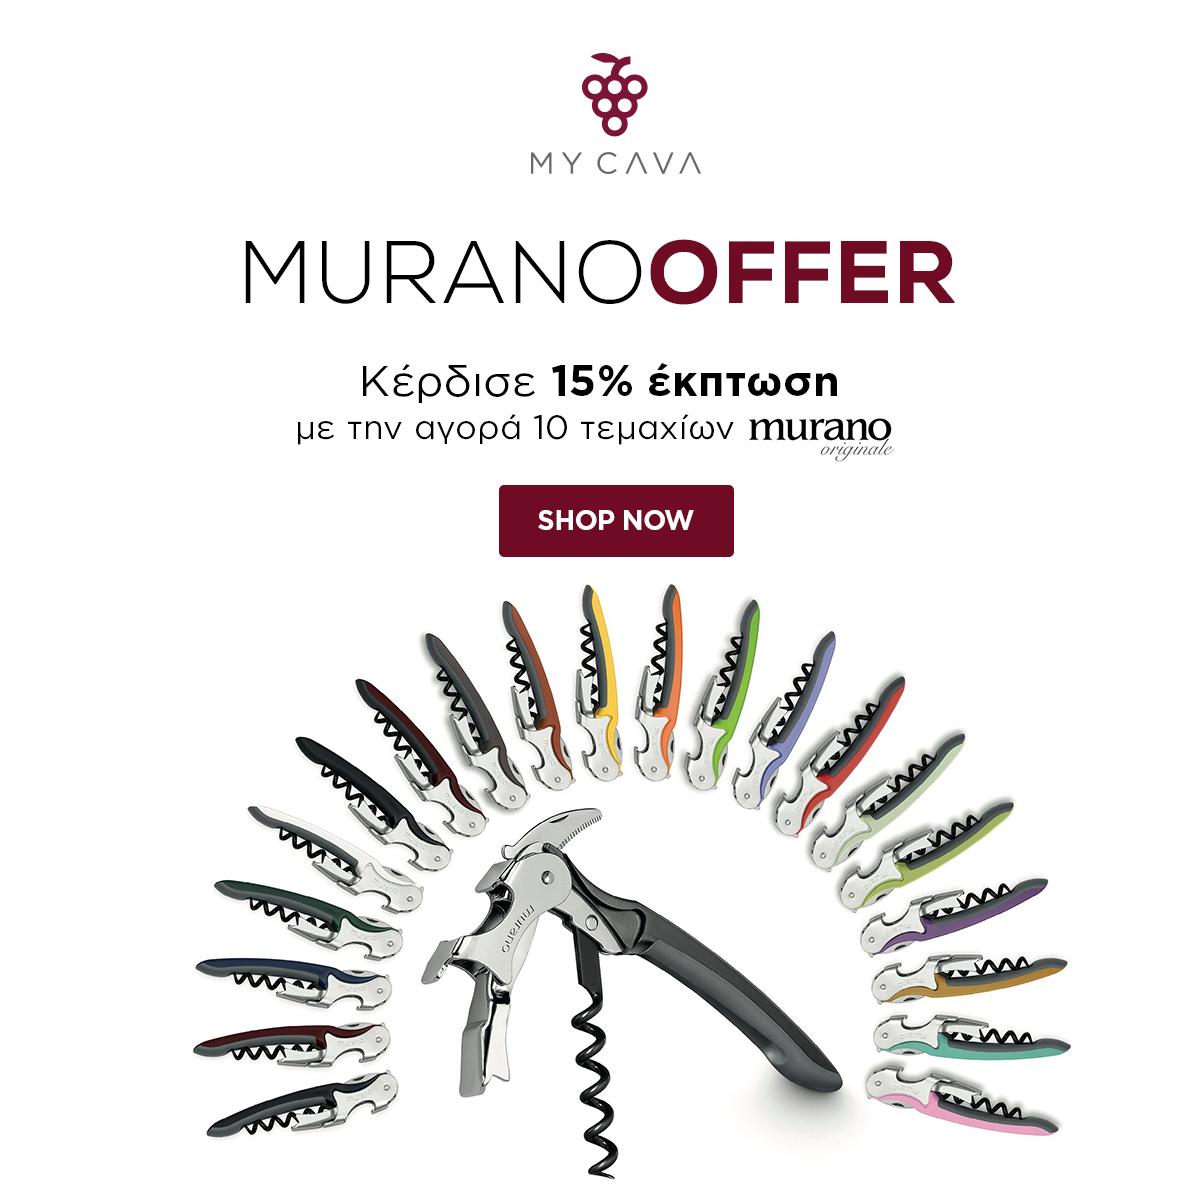 Murano Offer